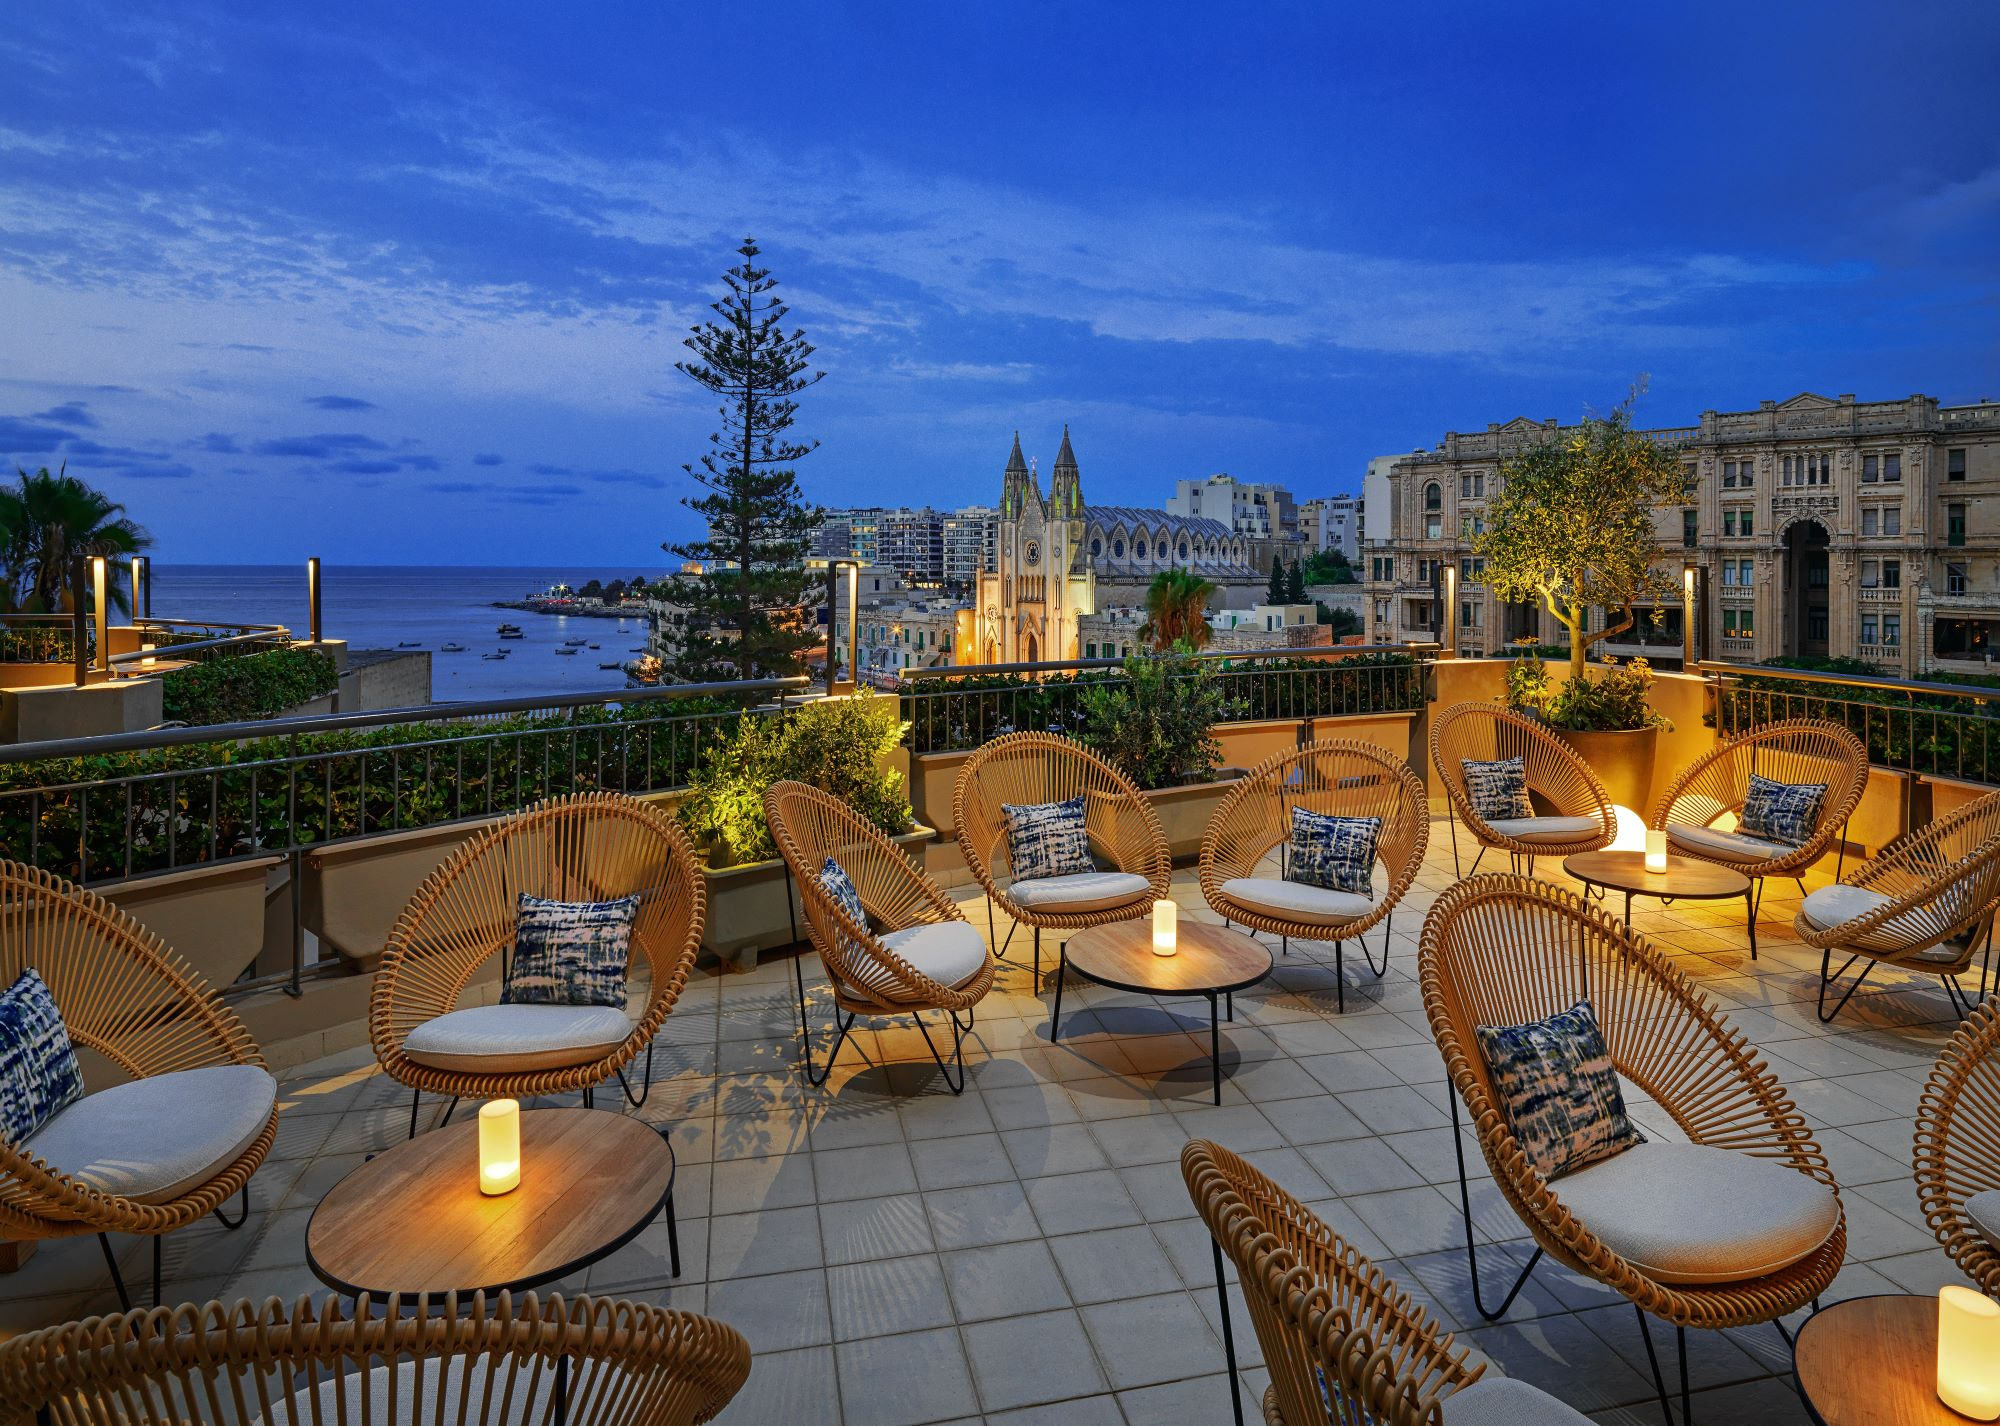 Marriott Malta Atrio terrace overlooking Balluta Bay